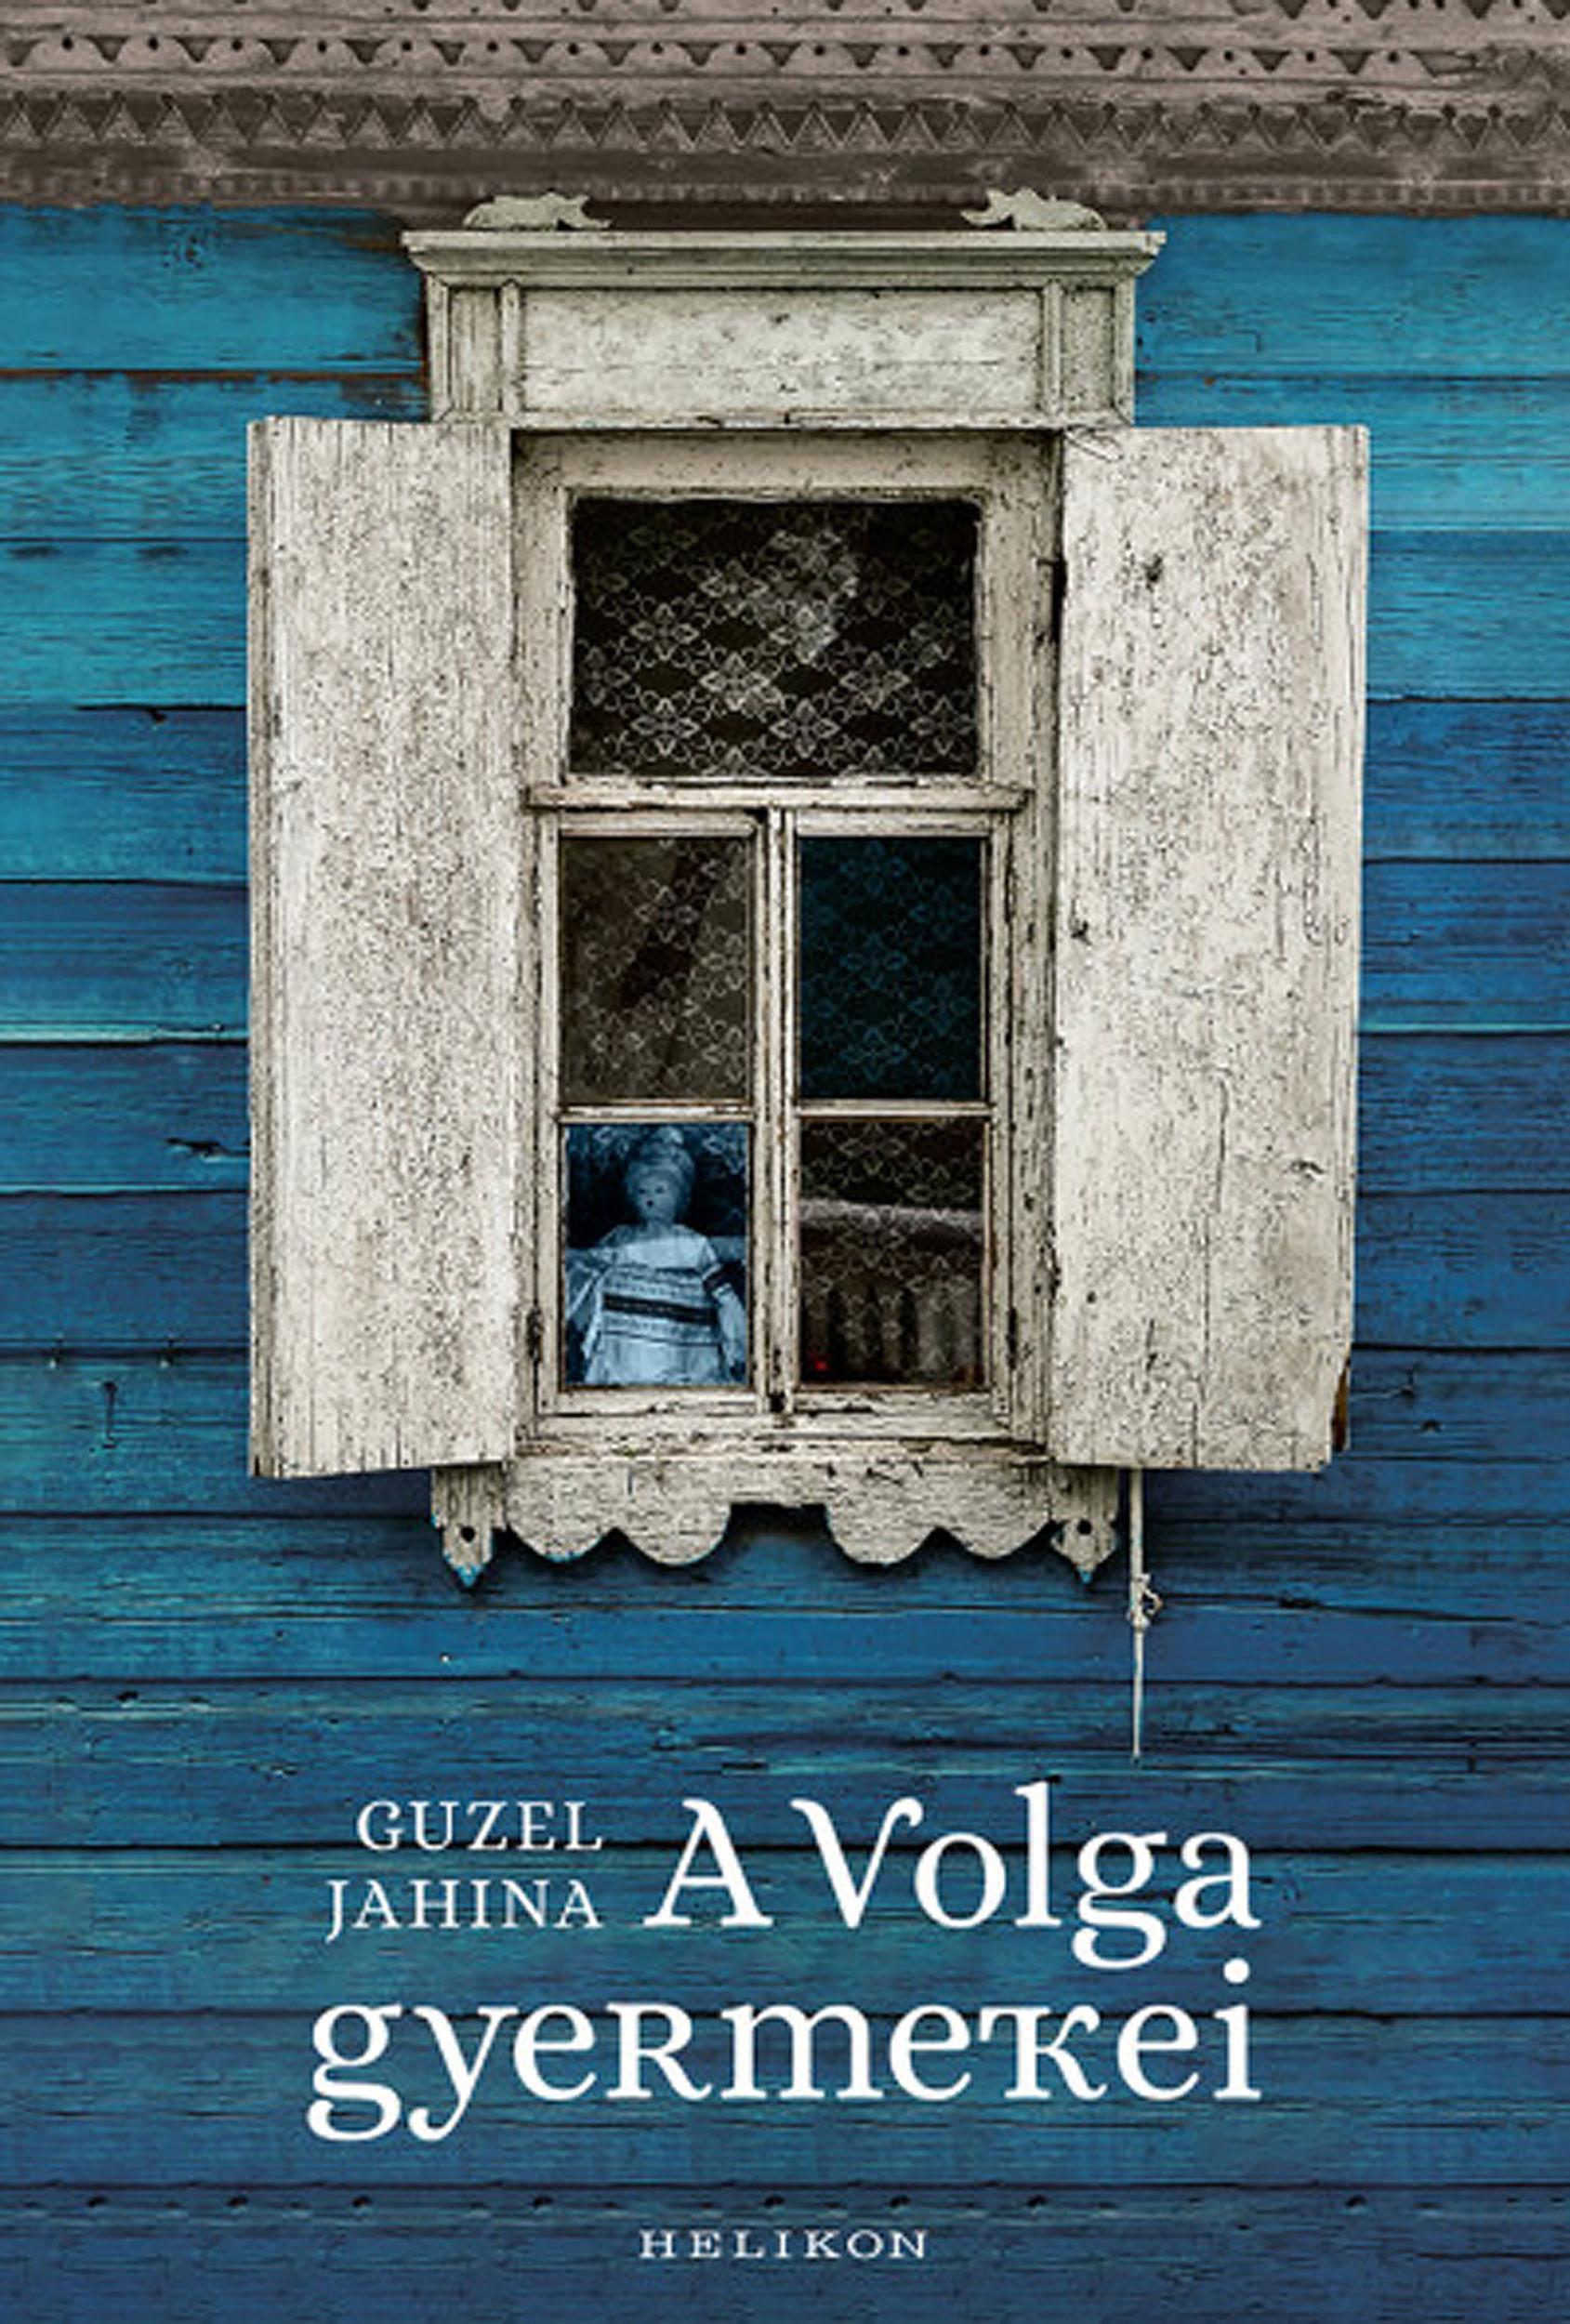 A Volga gyermekei